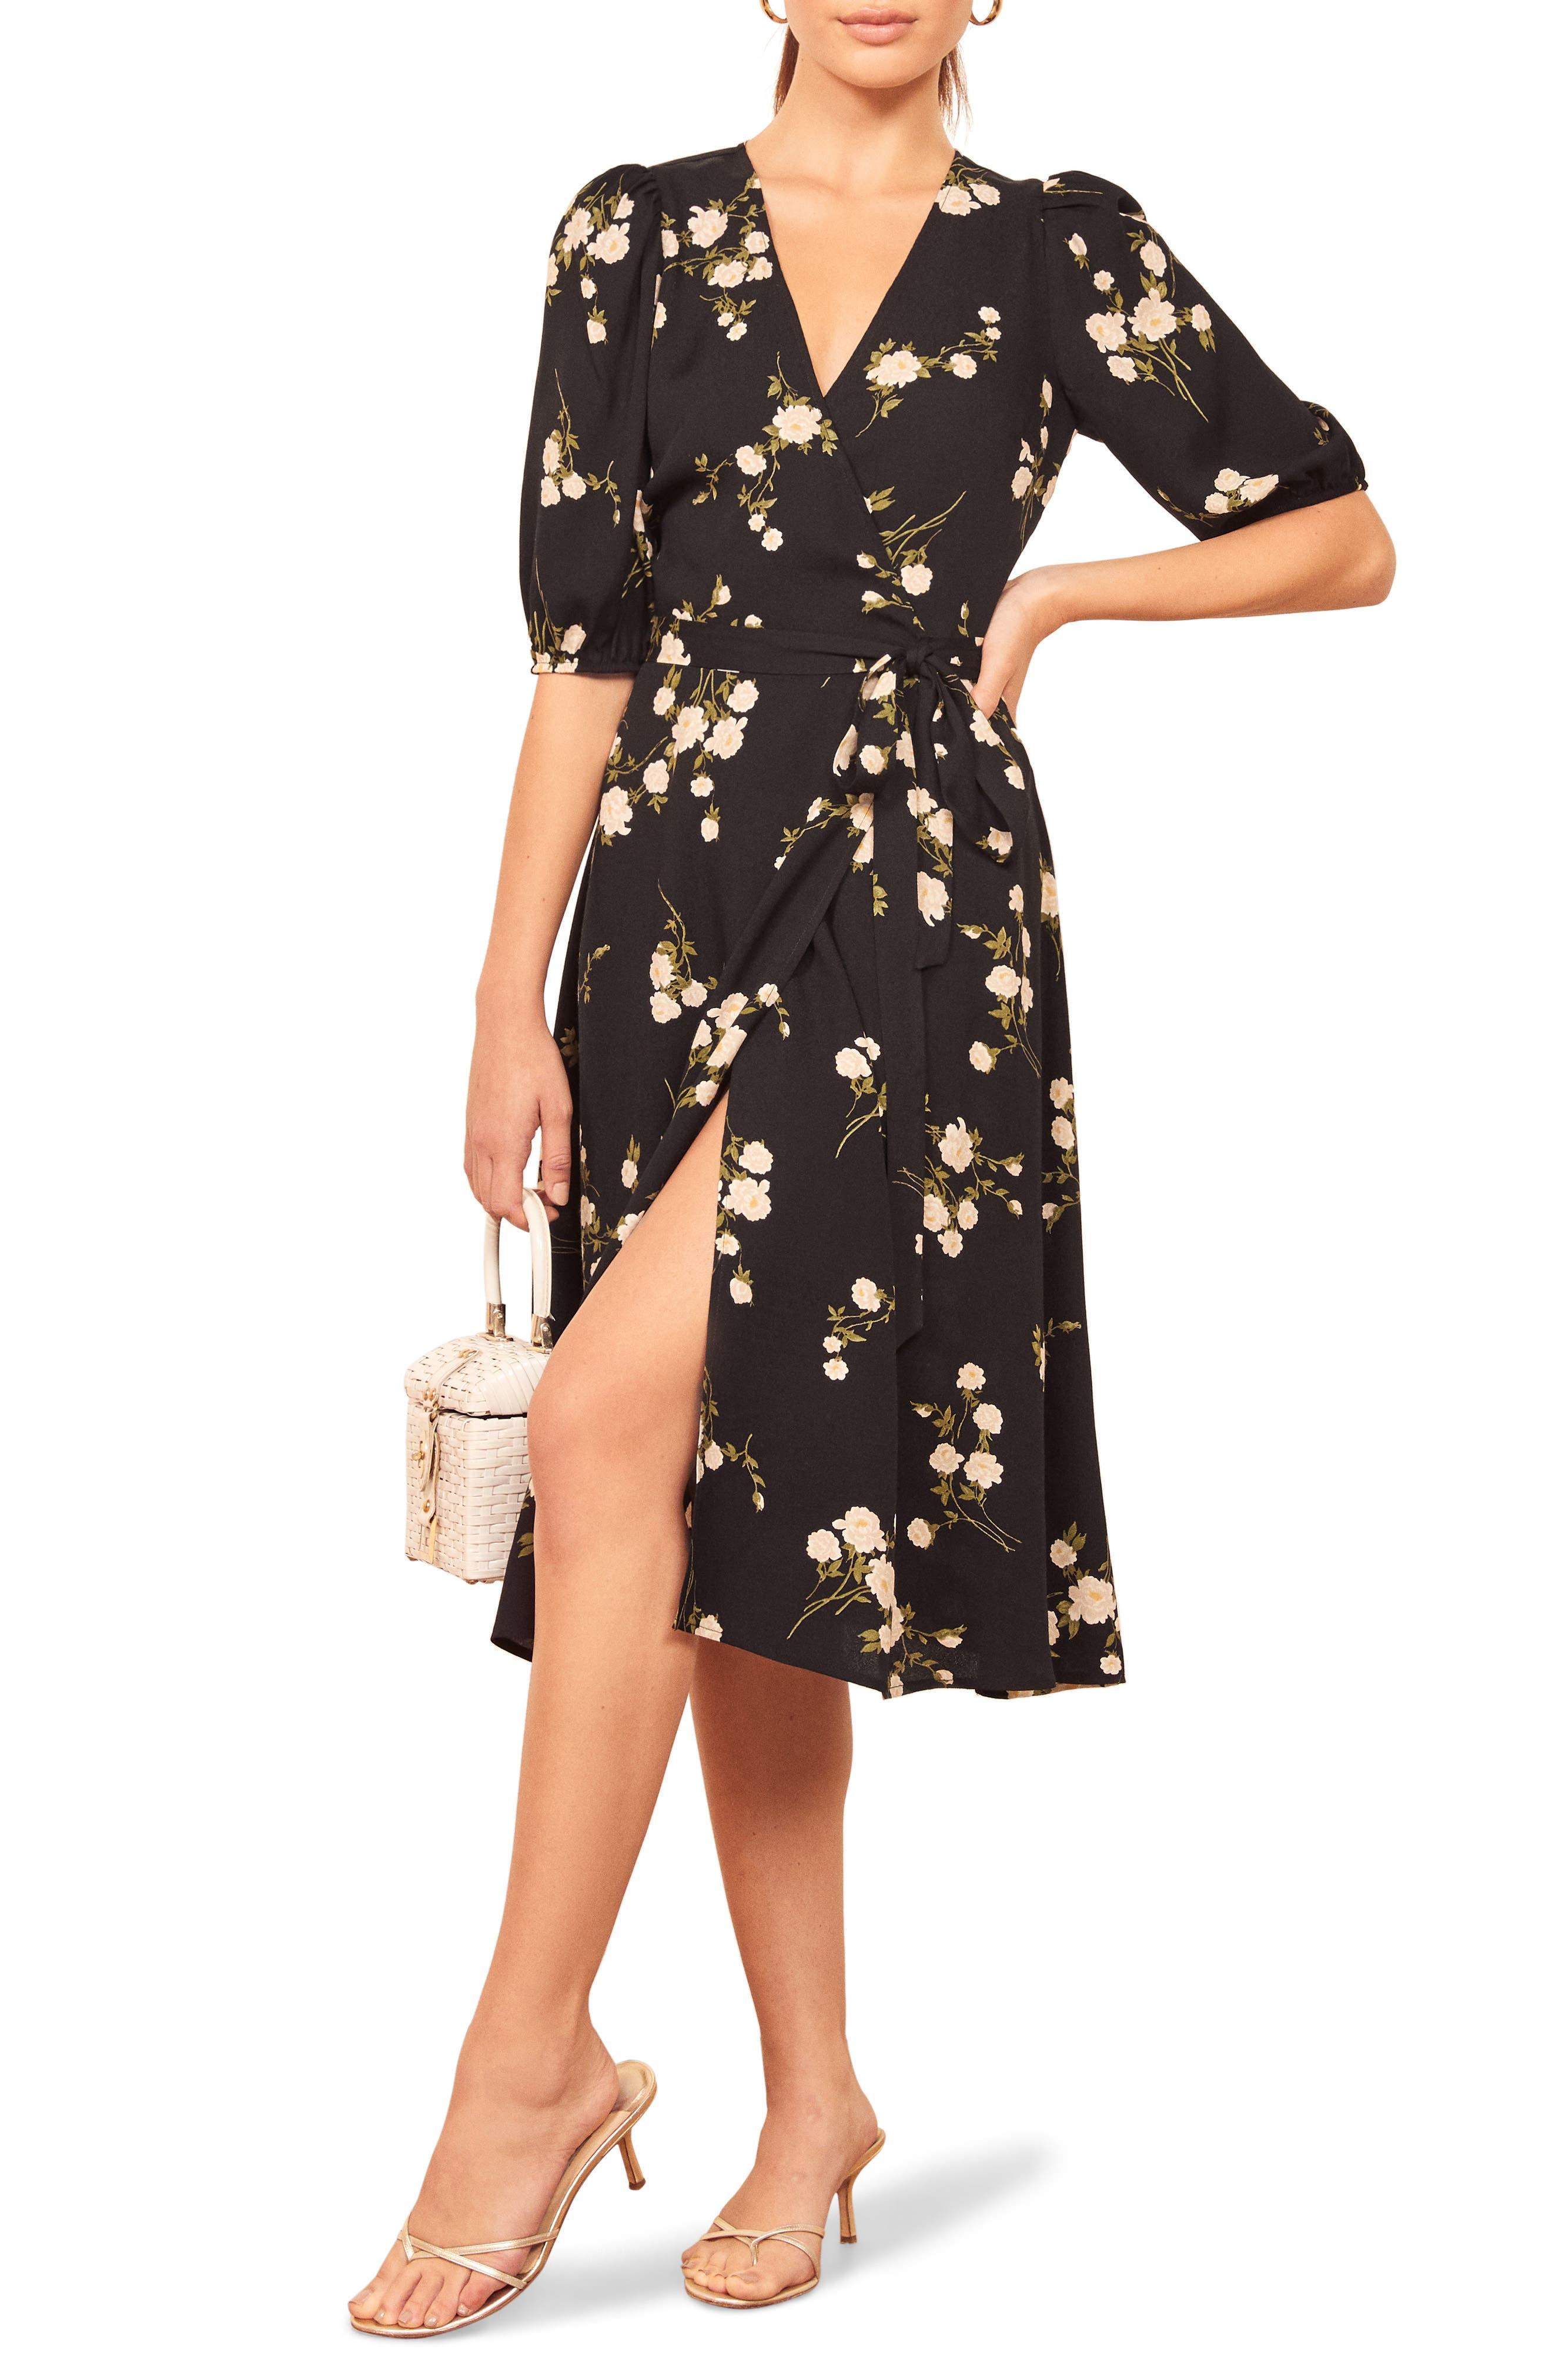 1940s Tea Dresses, Mature, Mrs. Long Sleeve Dresses Womens Reformation Christa Puff Sleeve Wrap Dress $218.00 AT vintagedancer.com